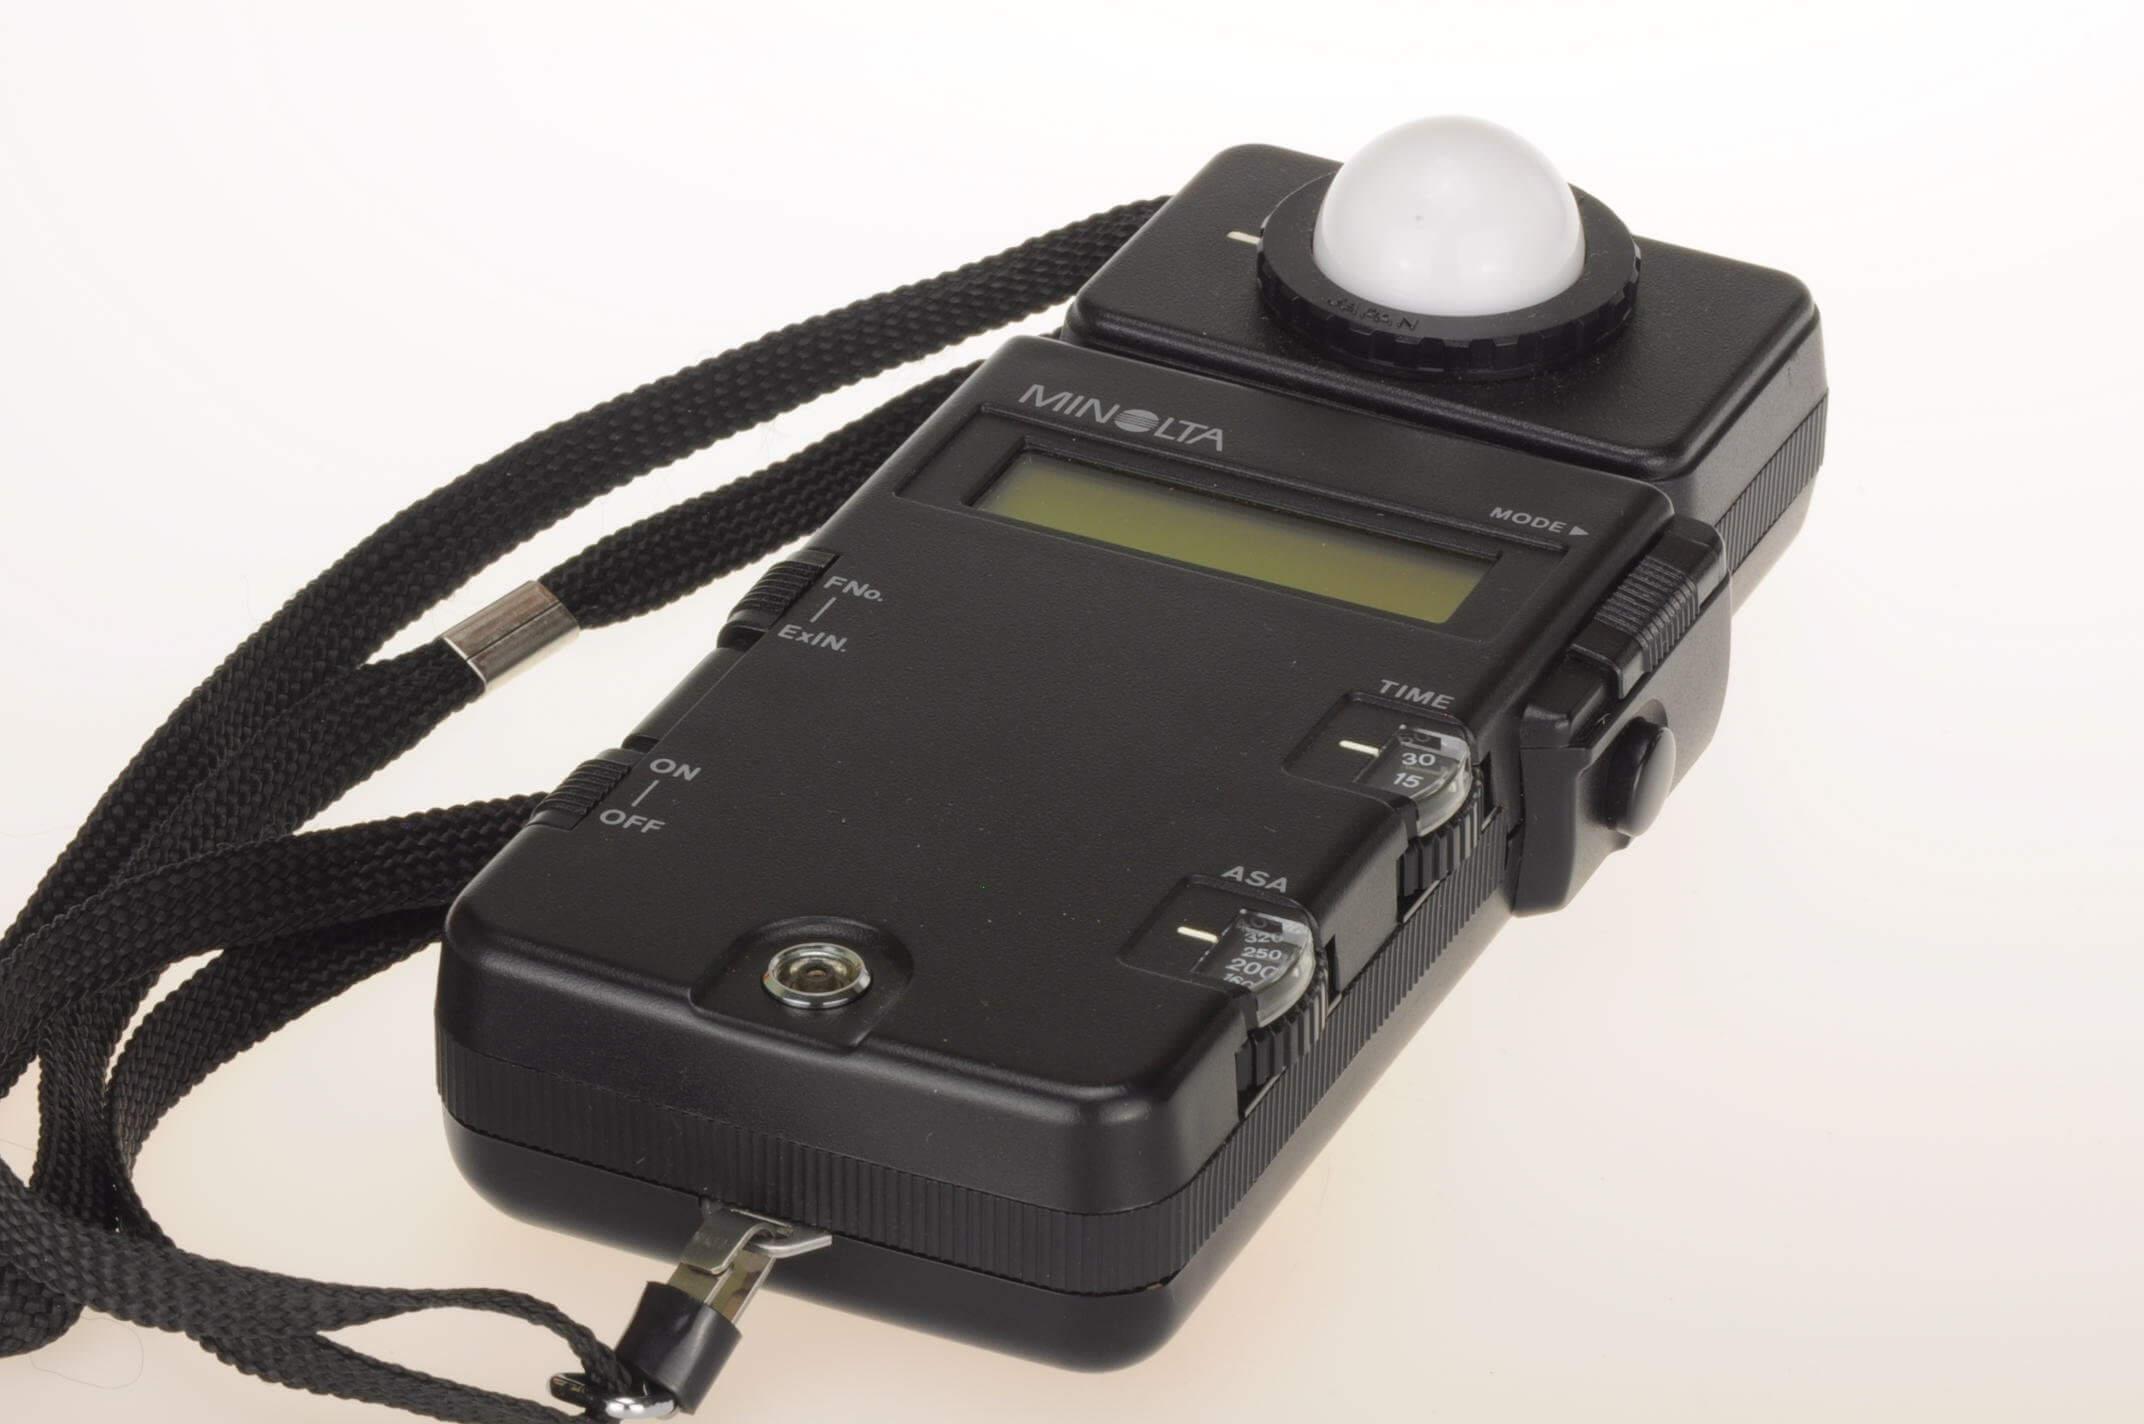 Minolta Flashmeter III, with case